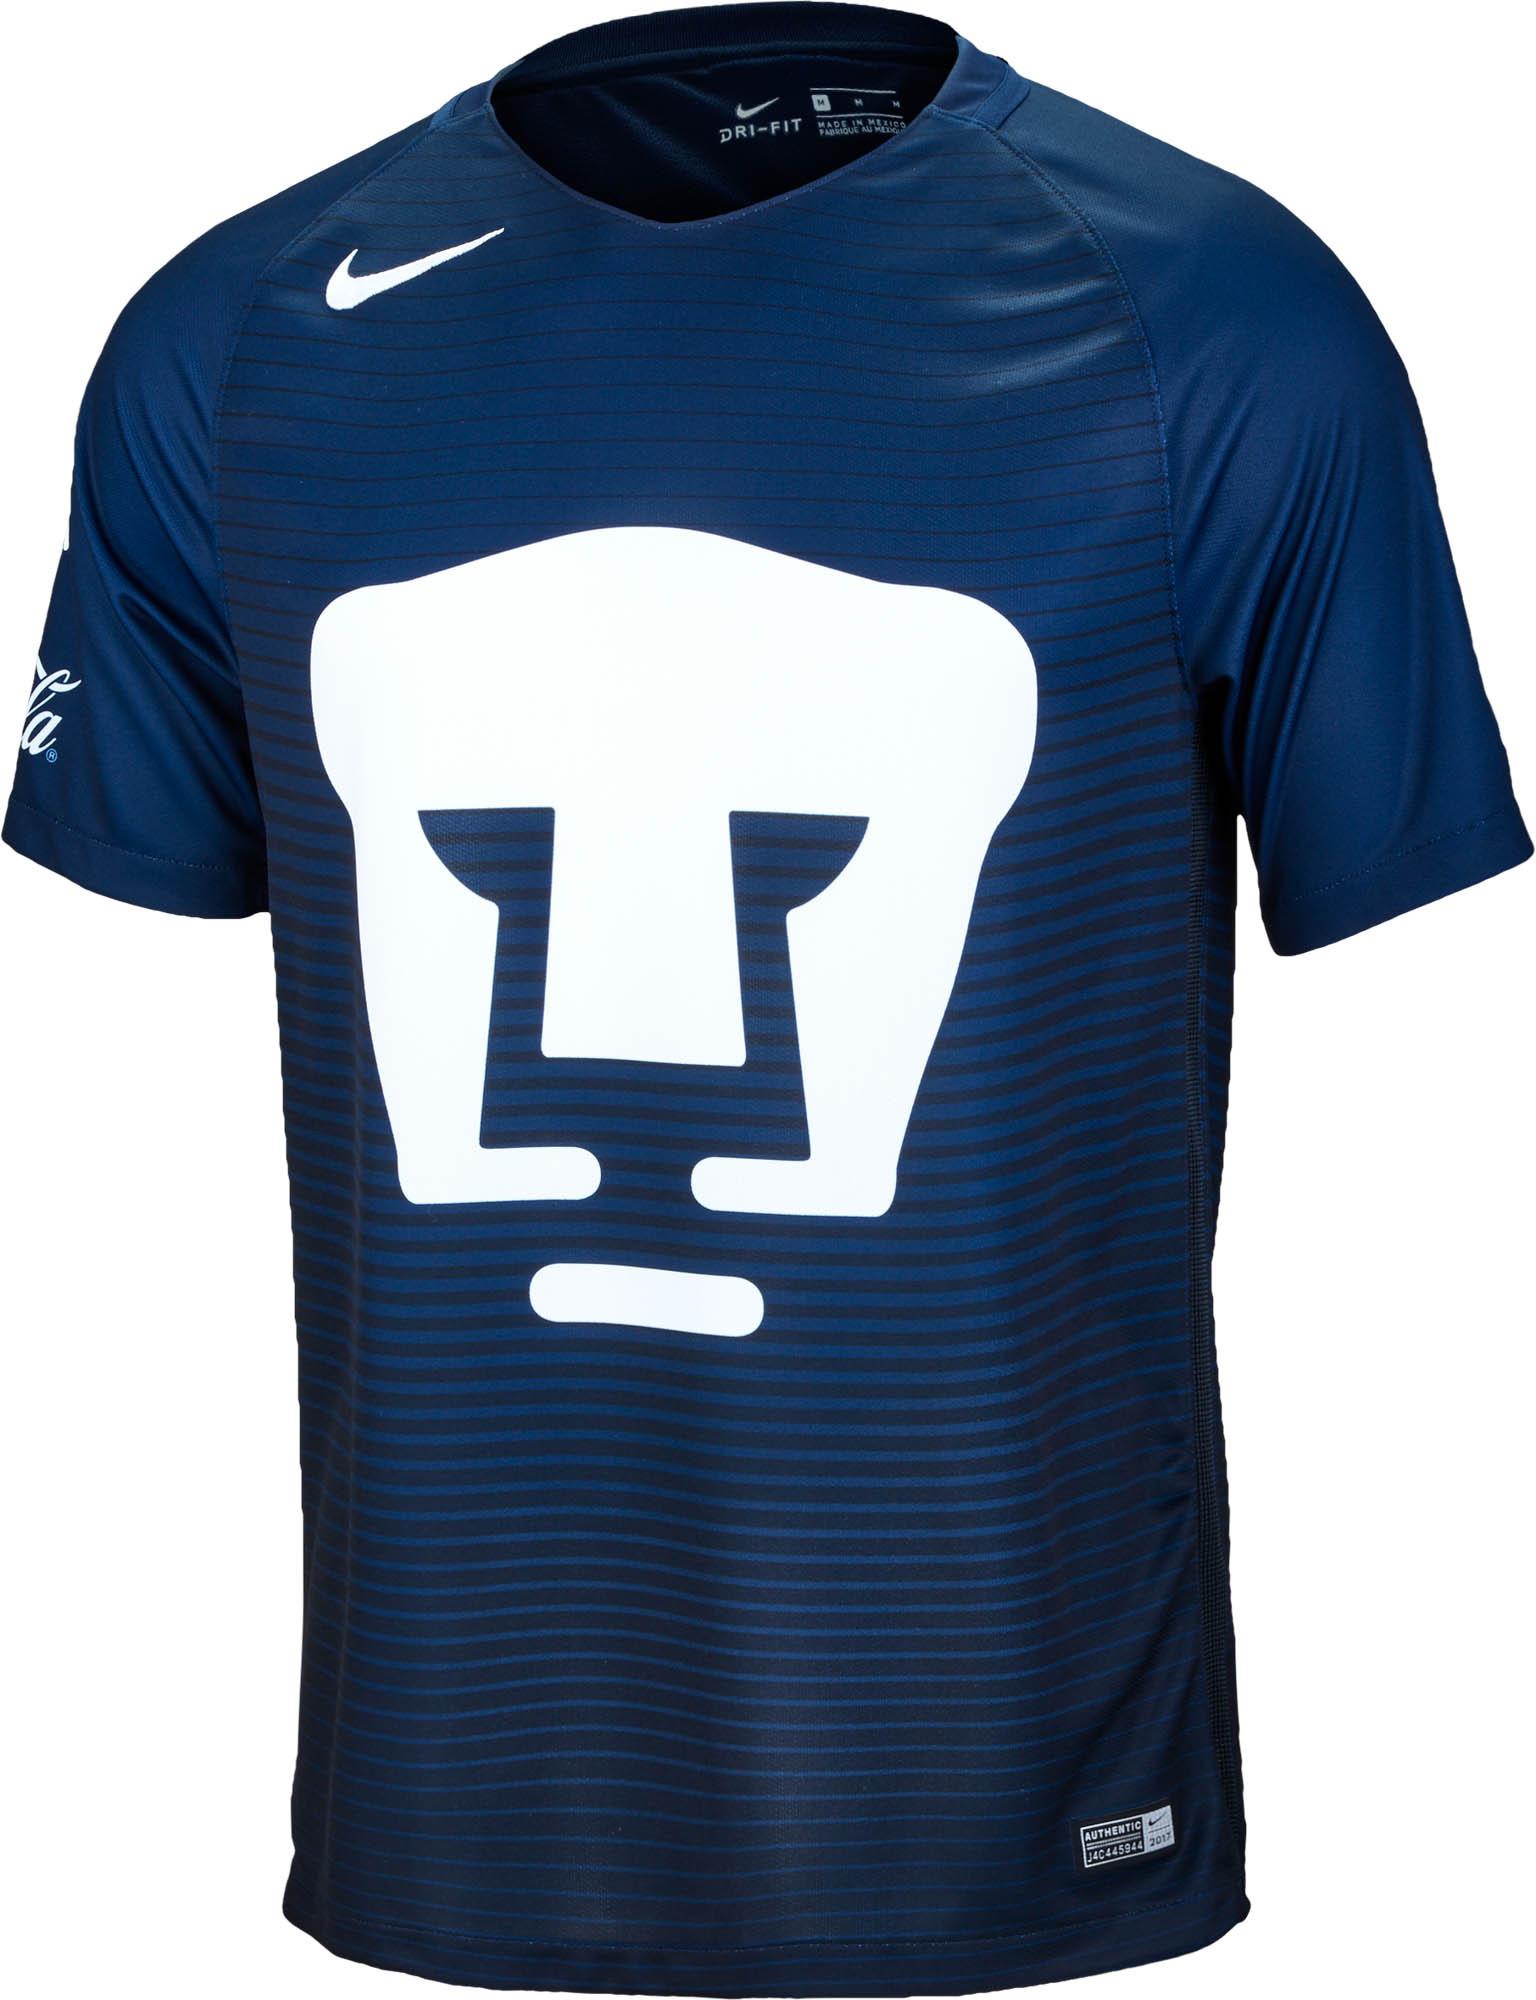 huge selection of 35339 98878 Nike Pumas 3rd Jersey 2016-17